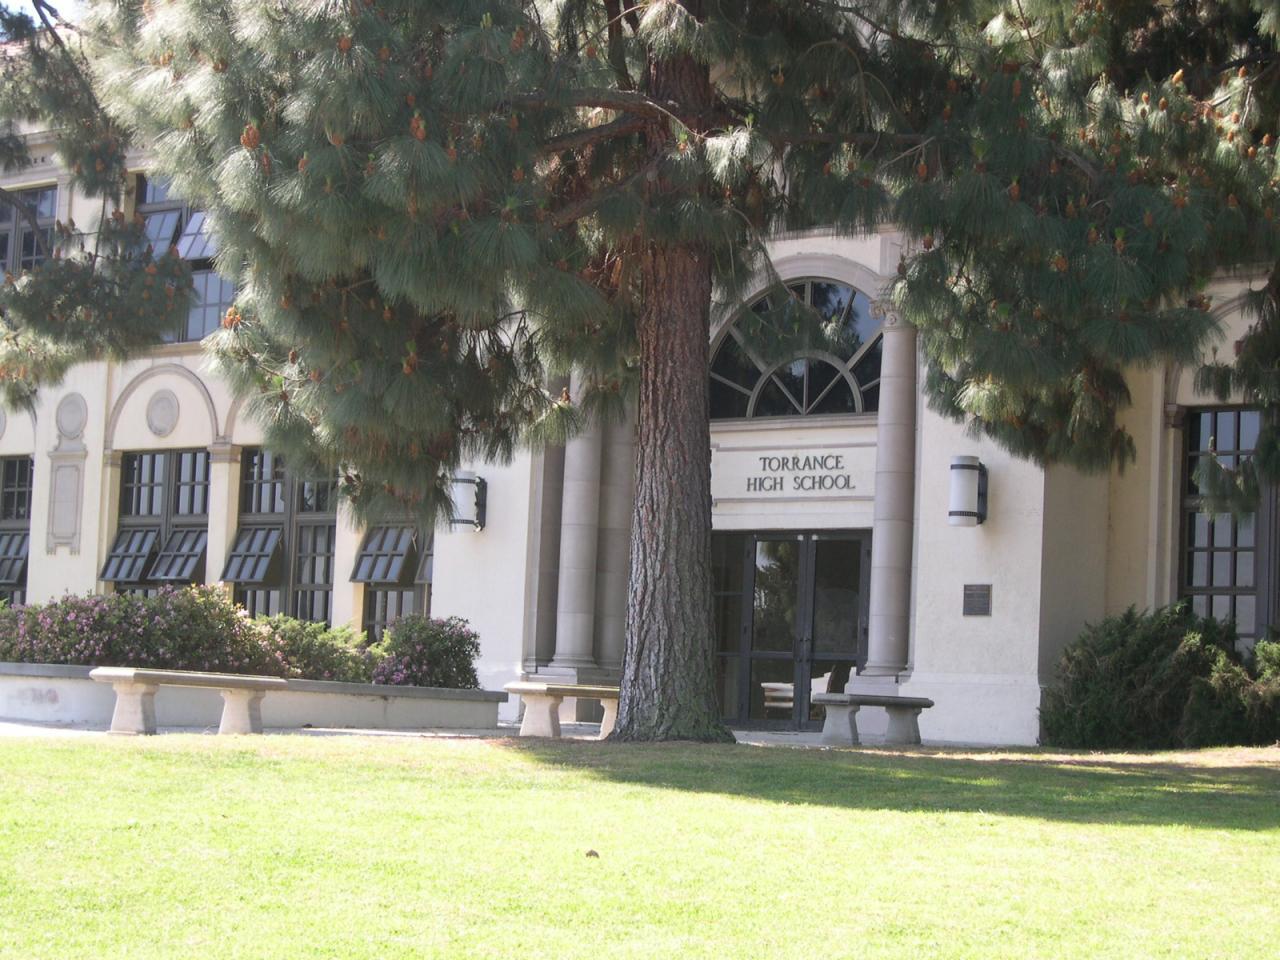 Sunnydale High (Torrance High)